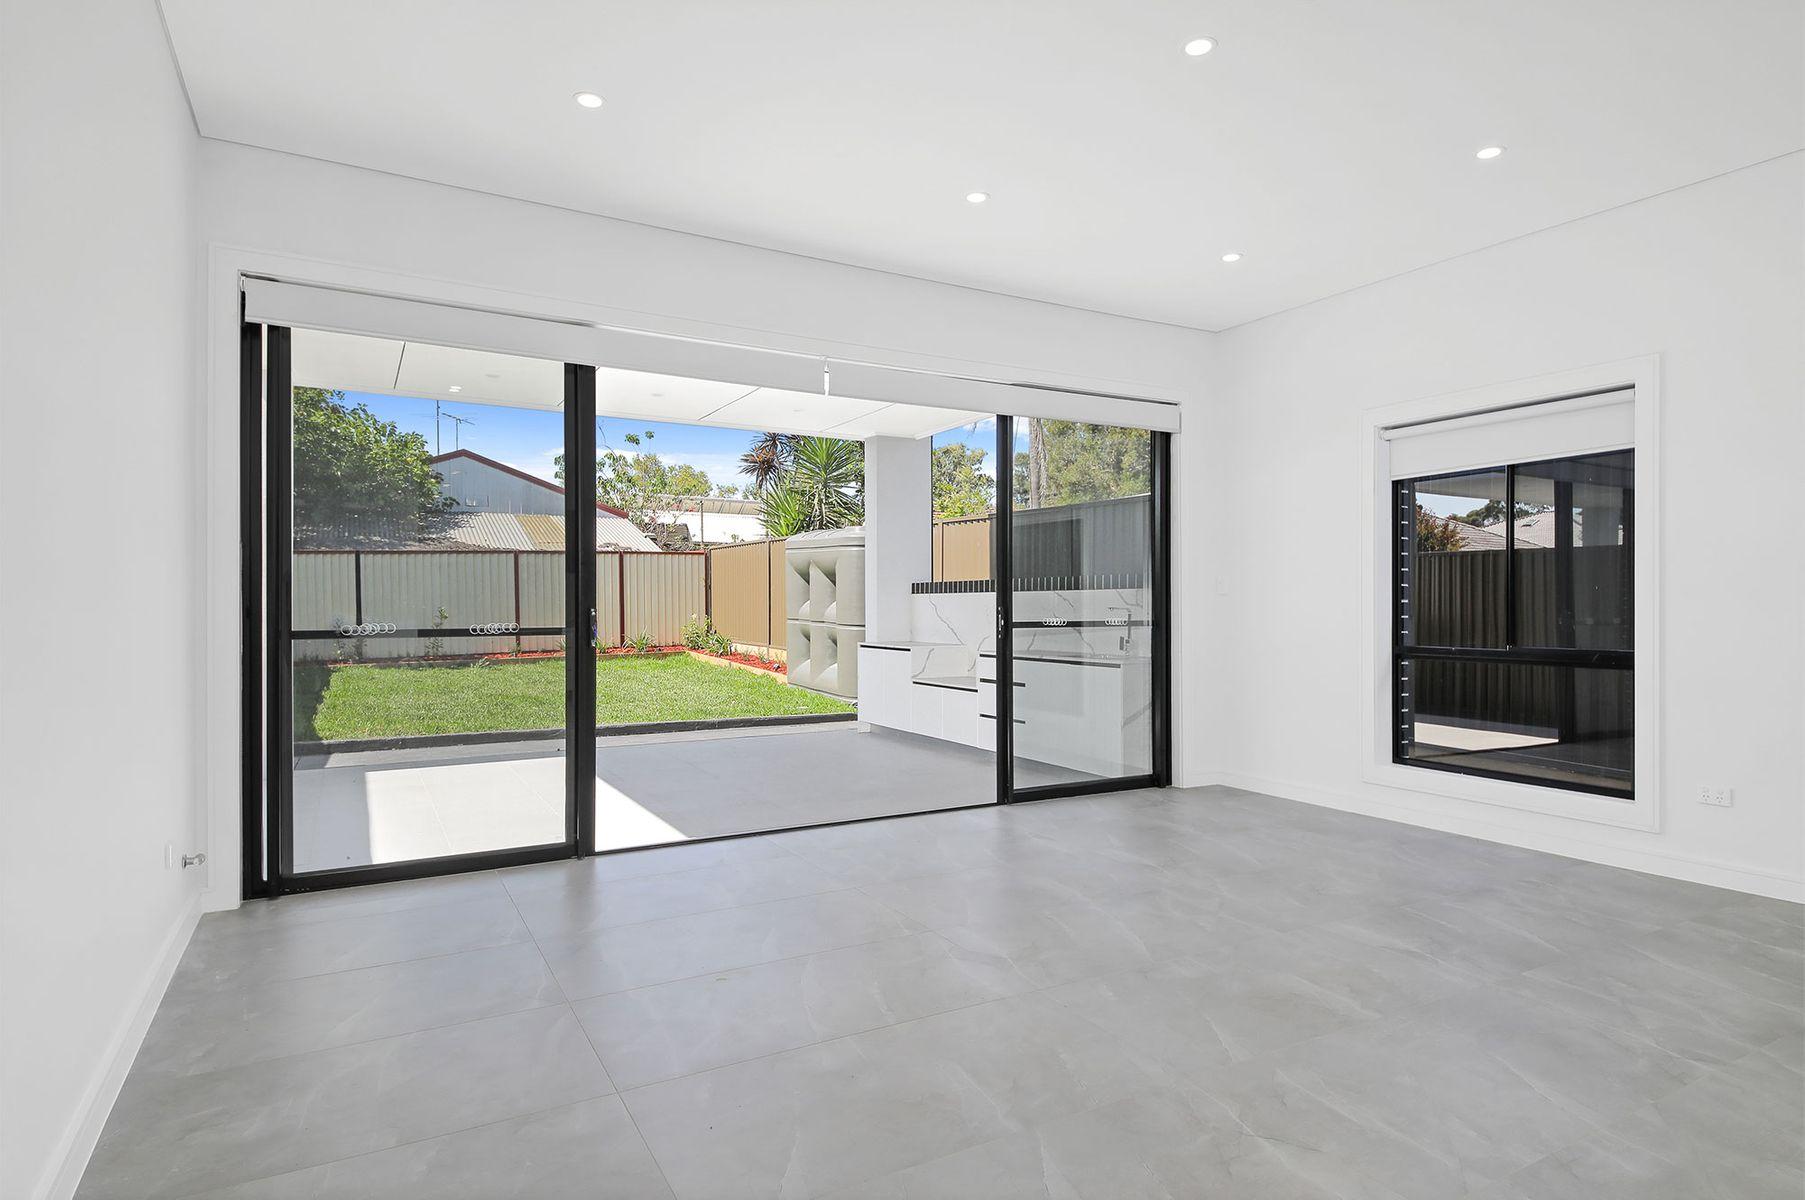 182 Bransgrove Road, Panania, NSW 2213